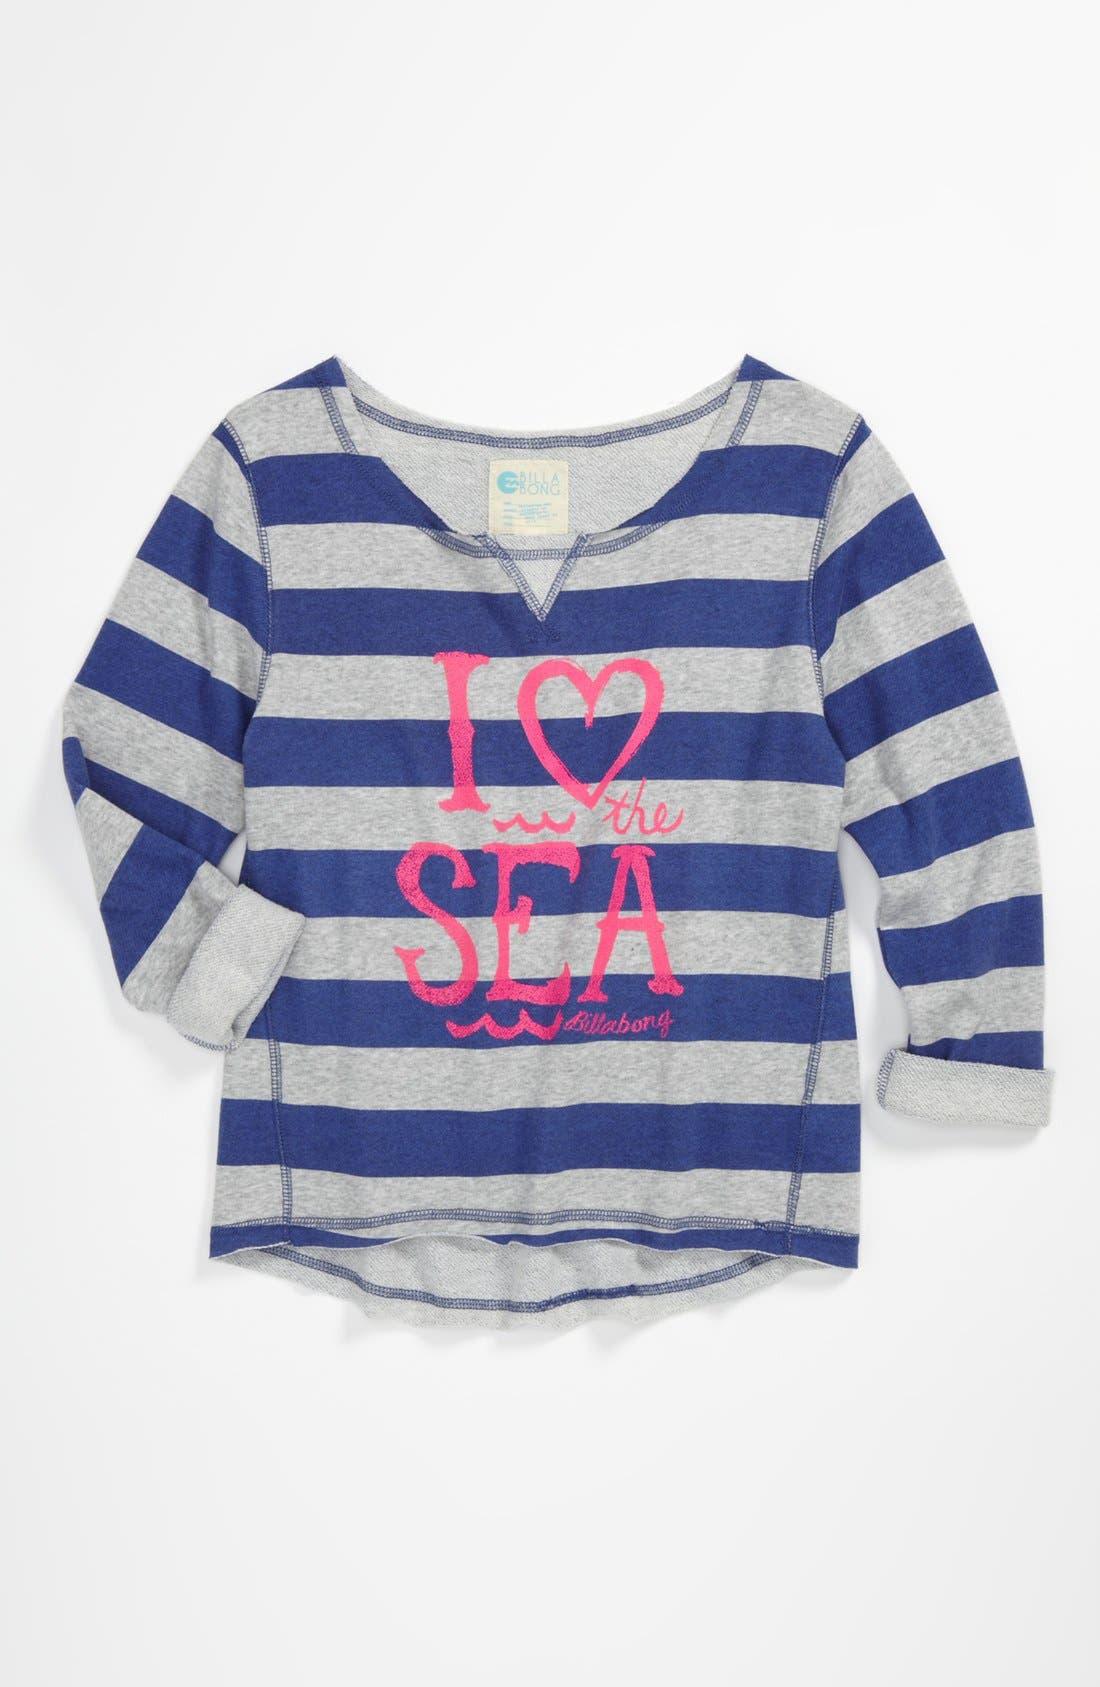 Main Image - Billabong 'Breaking It Down' Sweatshirt (Big Girls)